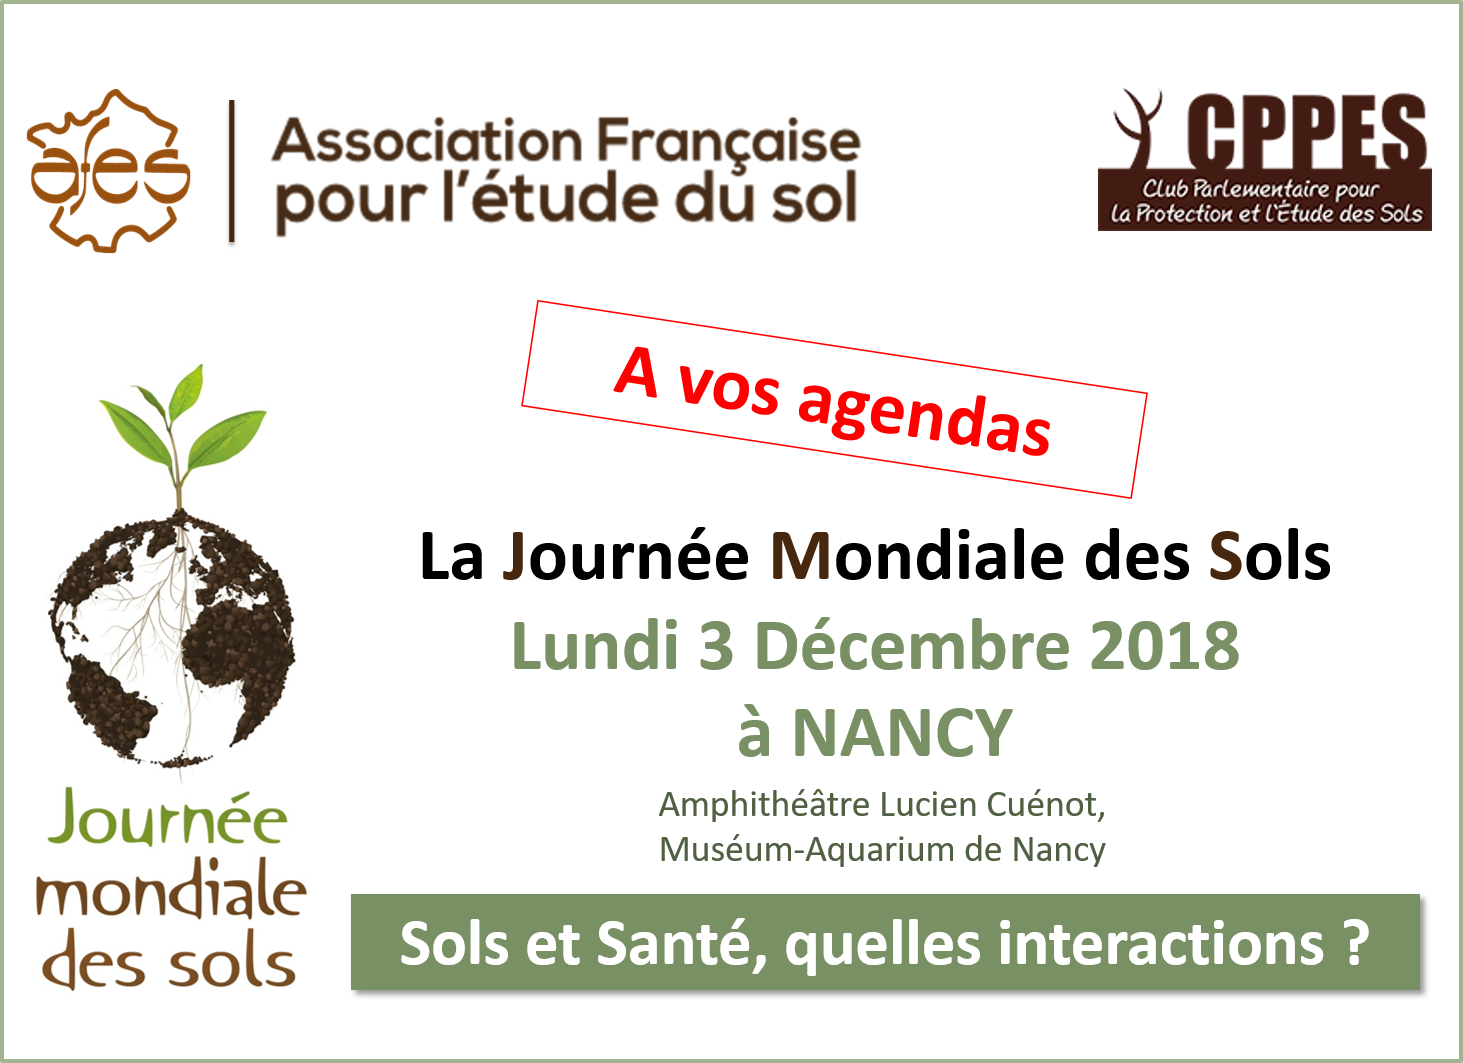 AFES - JMS 2018 a vos agendas avec lieu - 2018 10 08